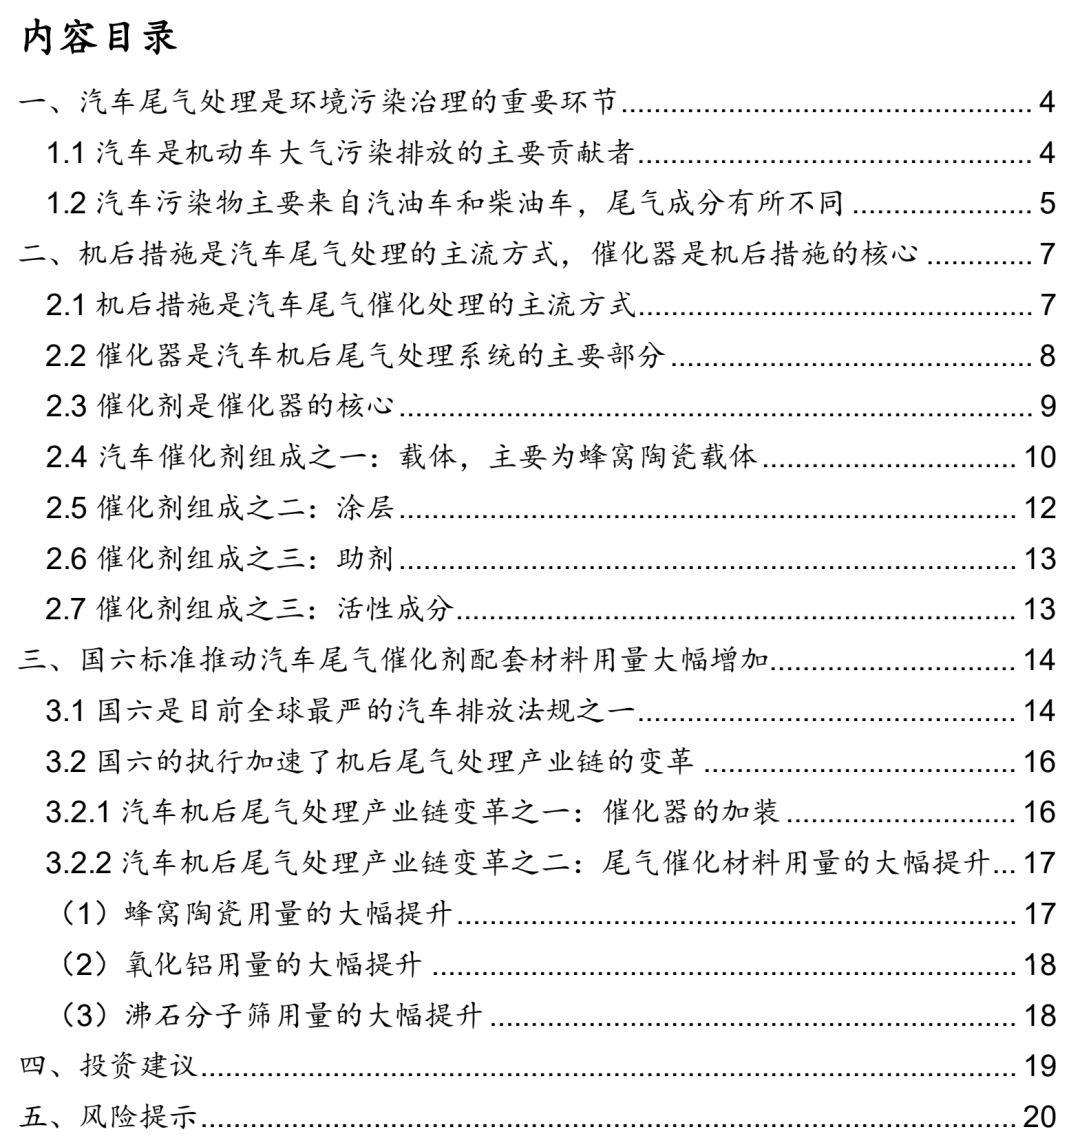 http://www.k2summit.cn/tiyujingsai/2003776.html